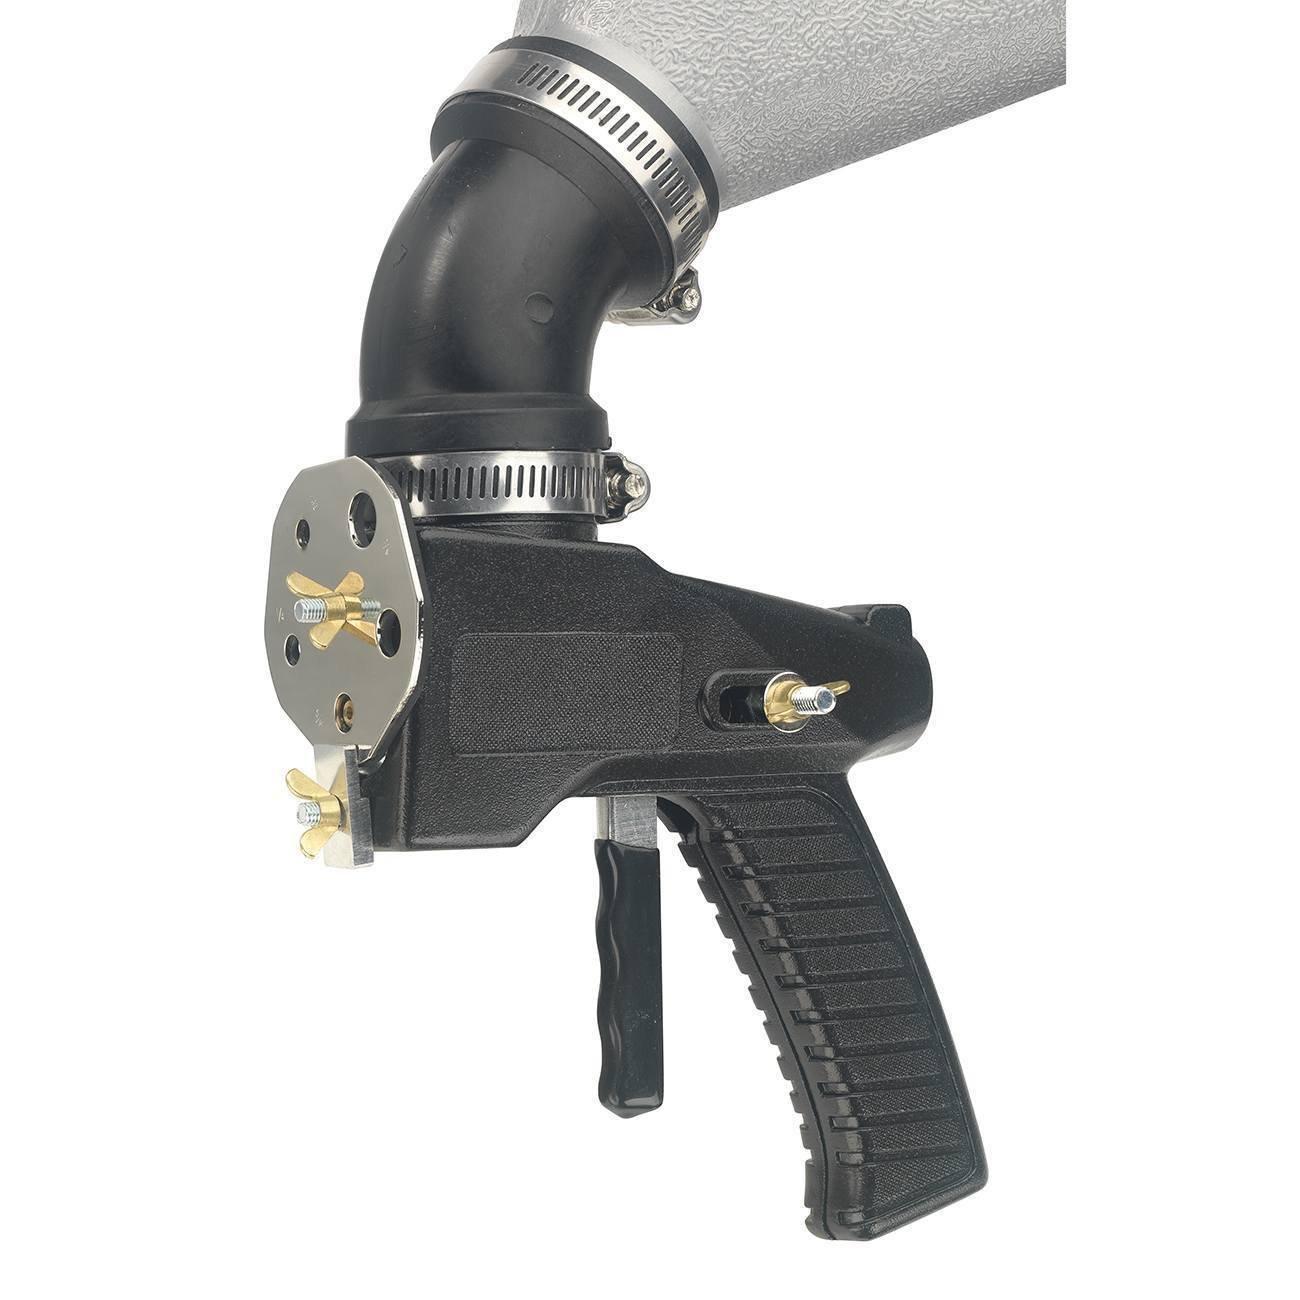 Car Paint Tool Air Texture Hopper Gun Spray Pistol Drywall Painting Tools Pro Pneumatic Durable Plastic - Skroutz by Skroutz (Image #3)